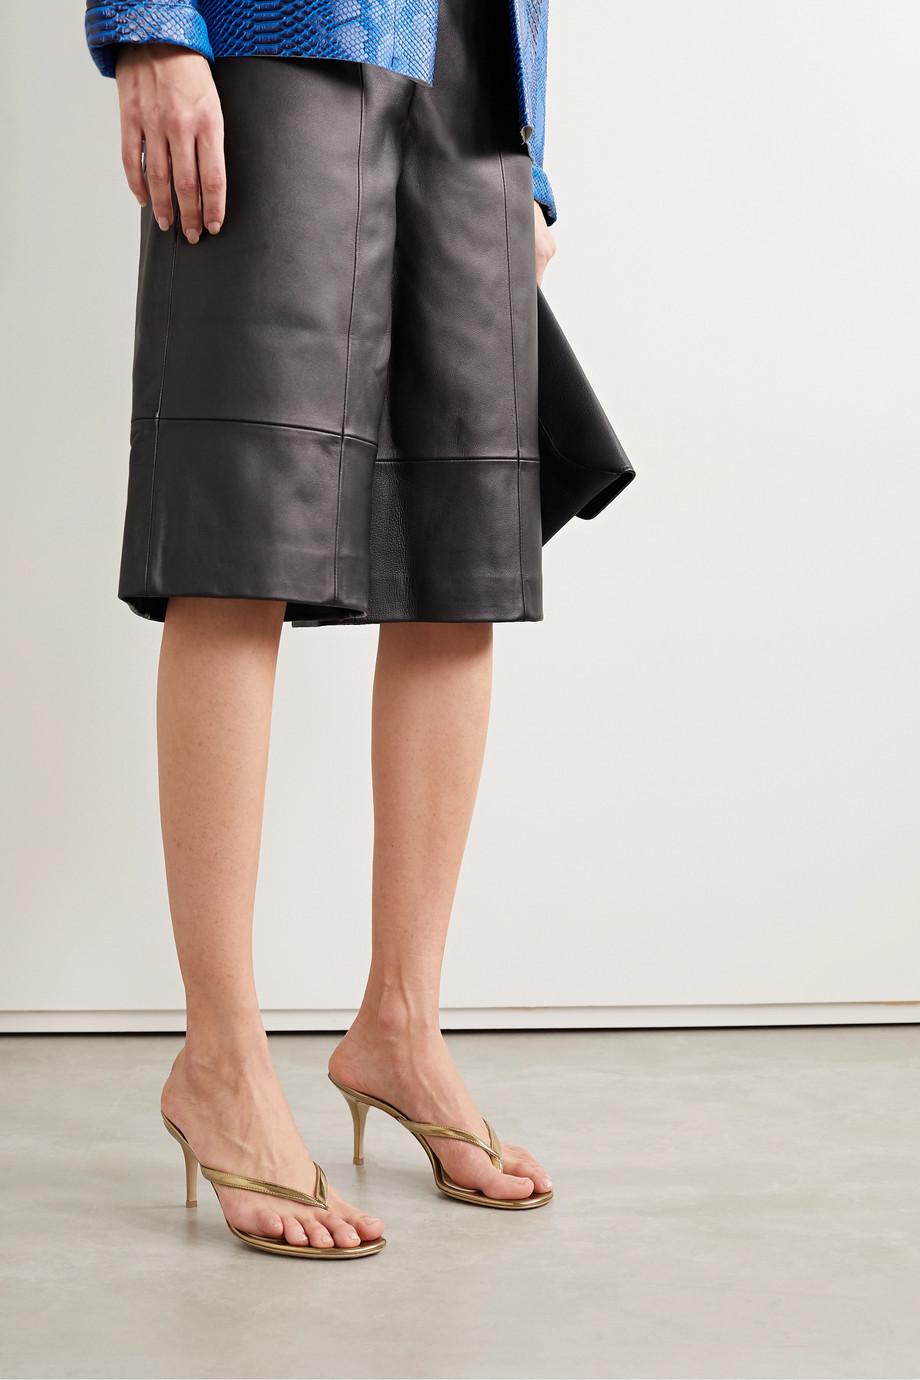 Gianvito Rossi Calypso 70 metallic leather sandals